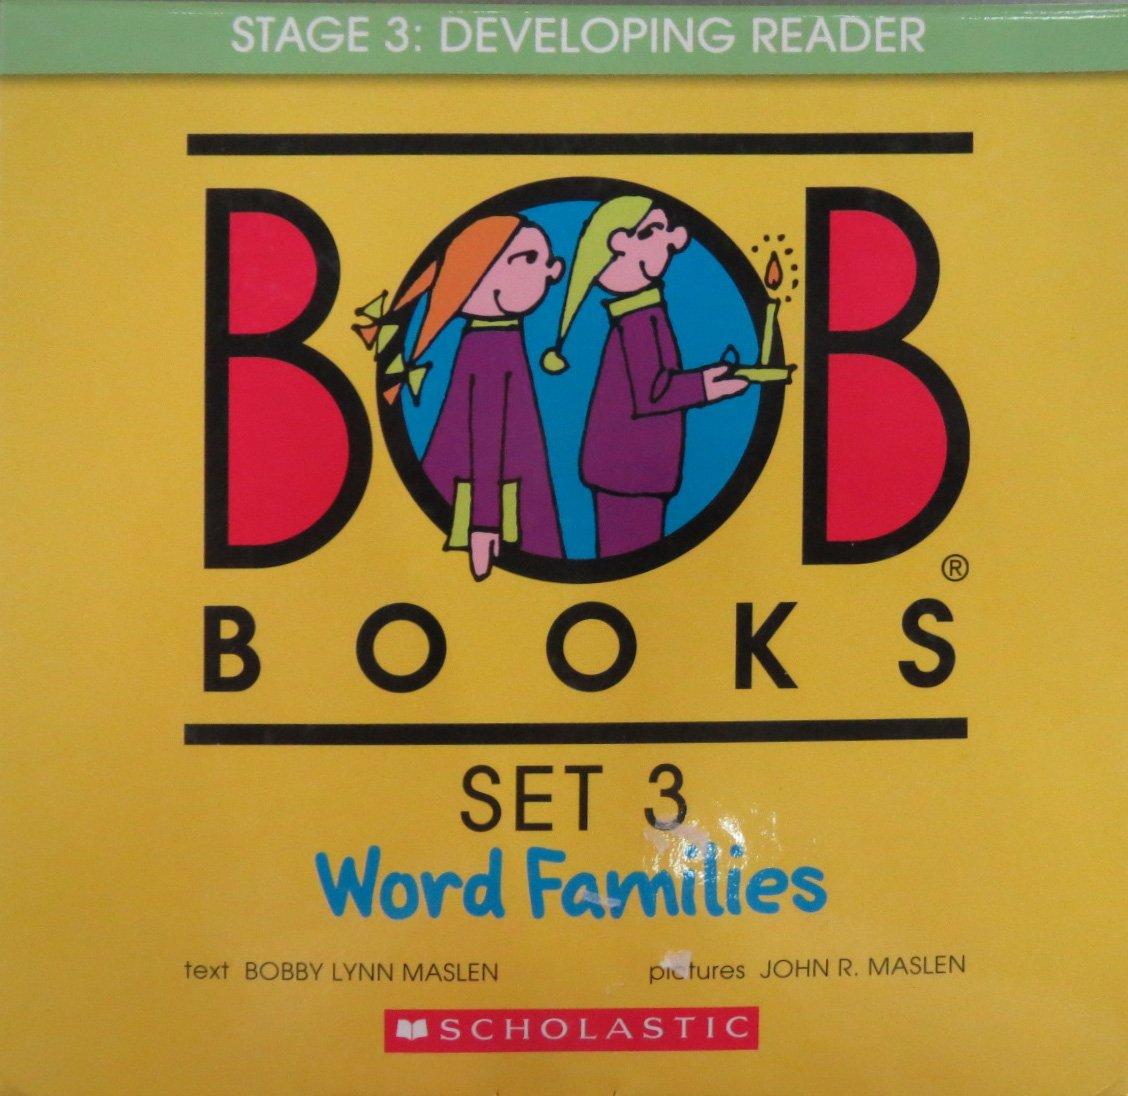 BOB books classroom set 3 word family families